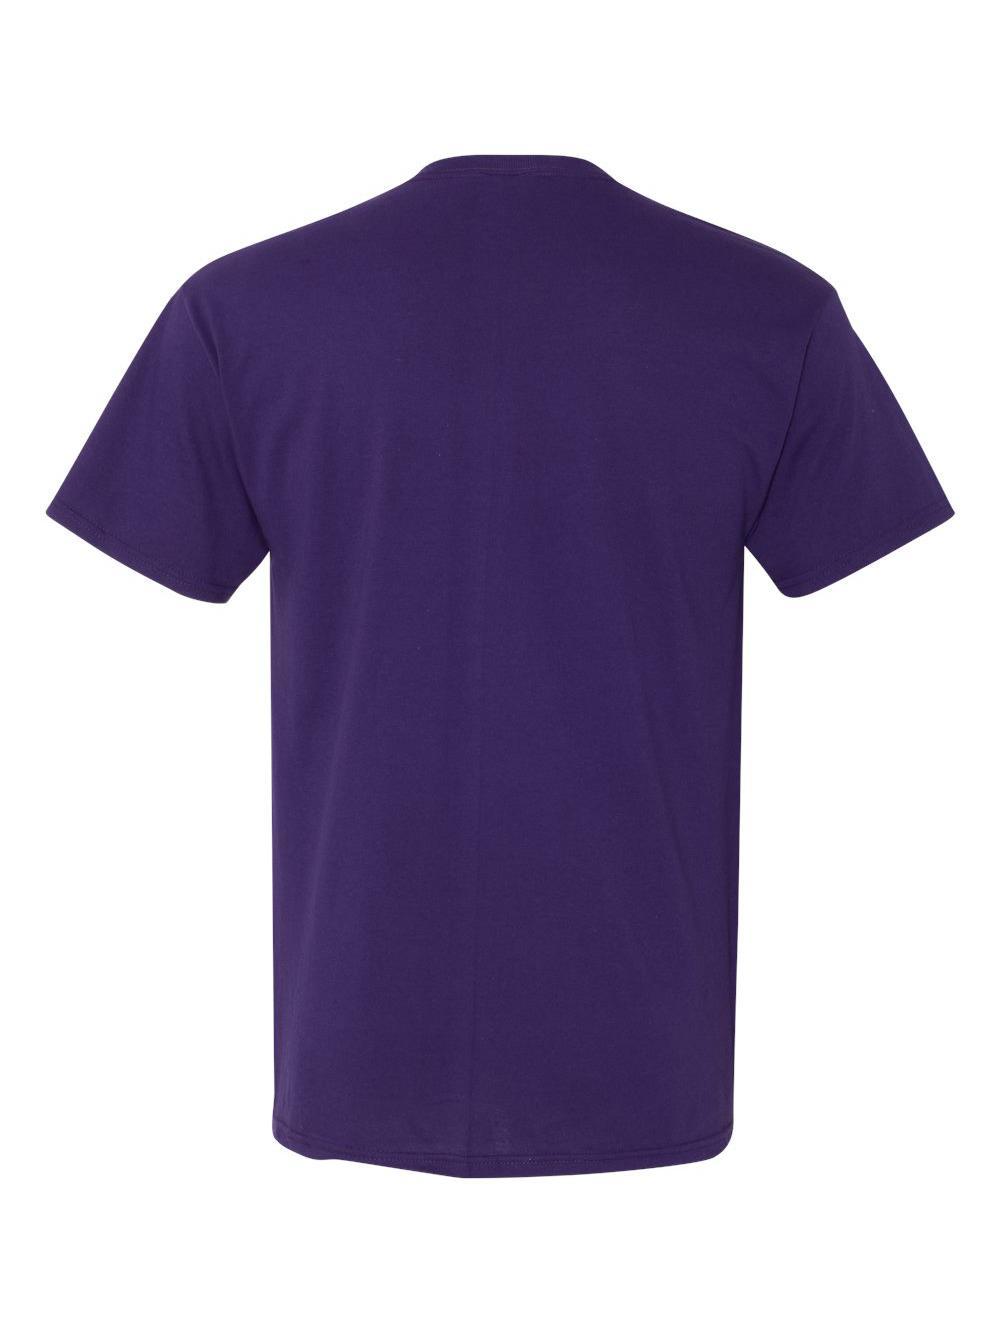 Fruit-of-the-Loom-HD-Cotton-Short-Sleeve-T-Shirt-3930R thumbnail 46